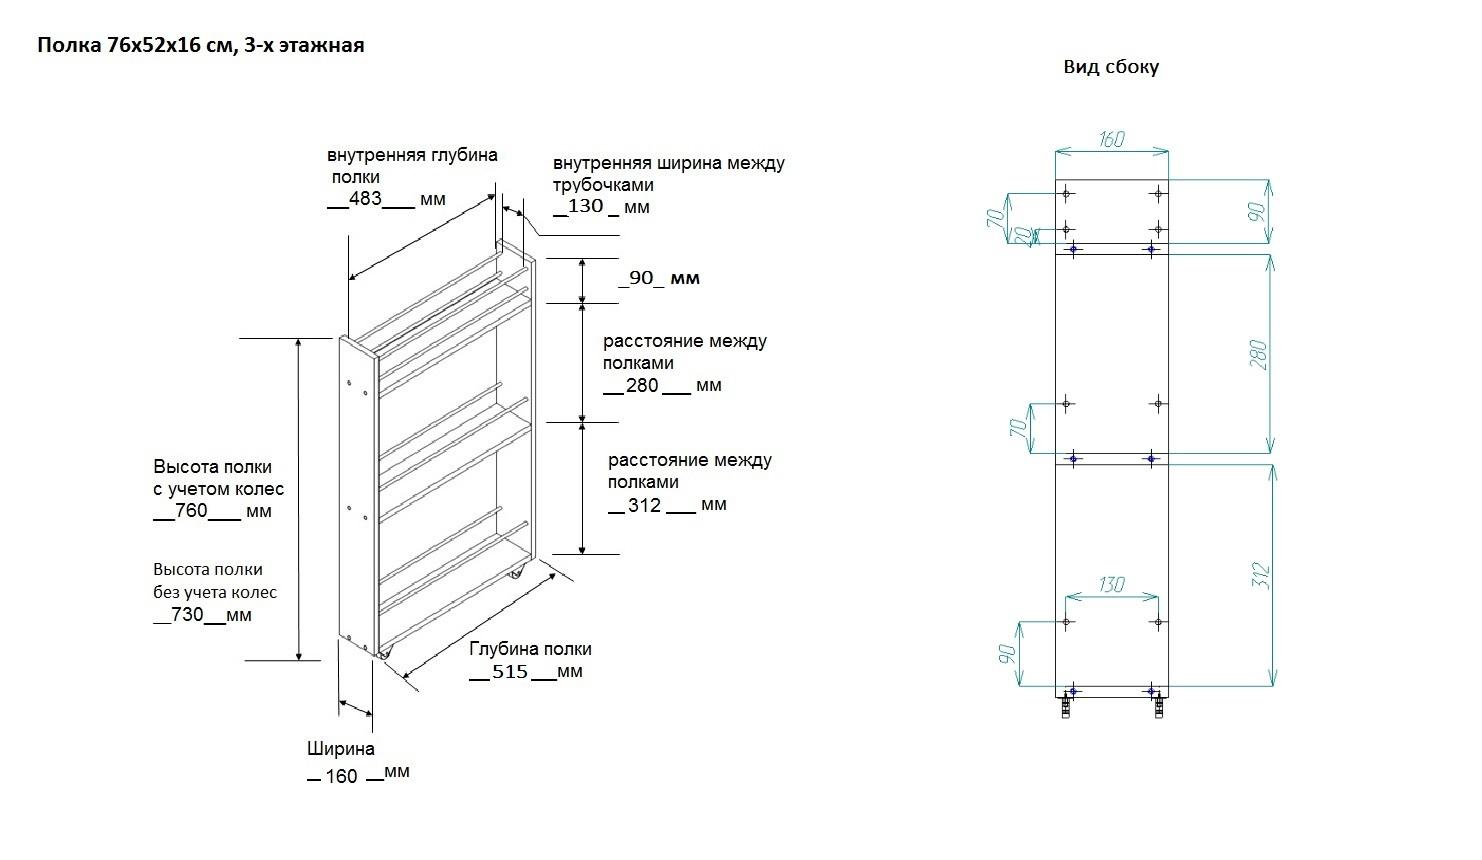 Полка выдвижная, для кухни и ванной комнаты 76х52х16 см, 3-х этажная, венге